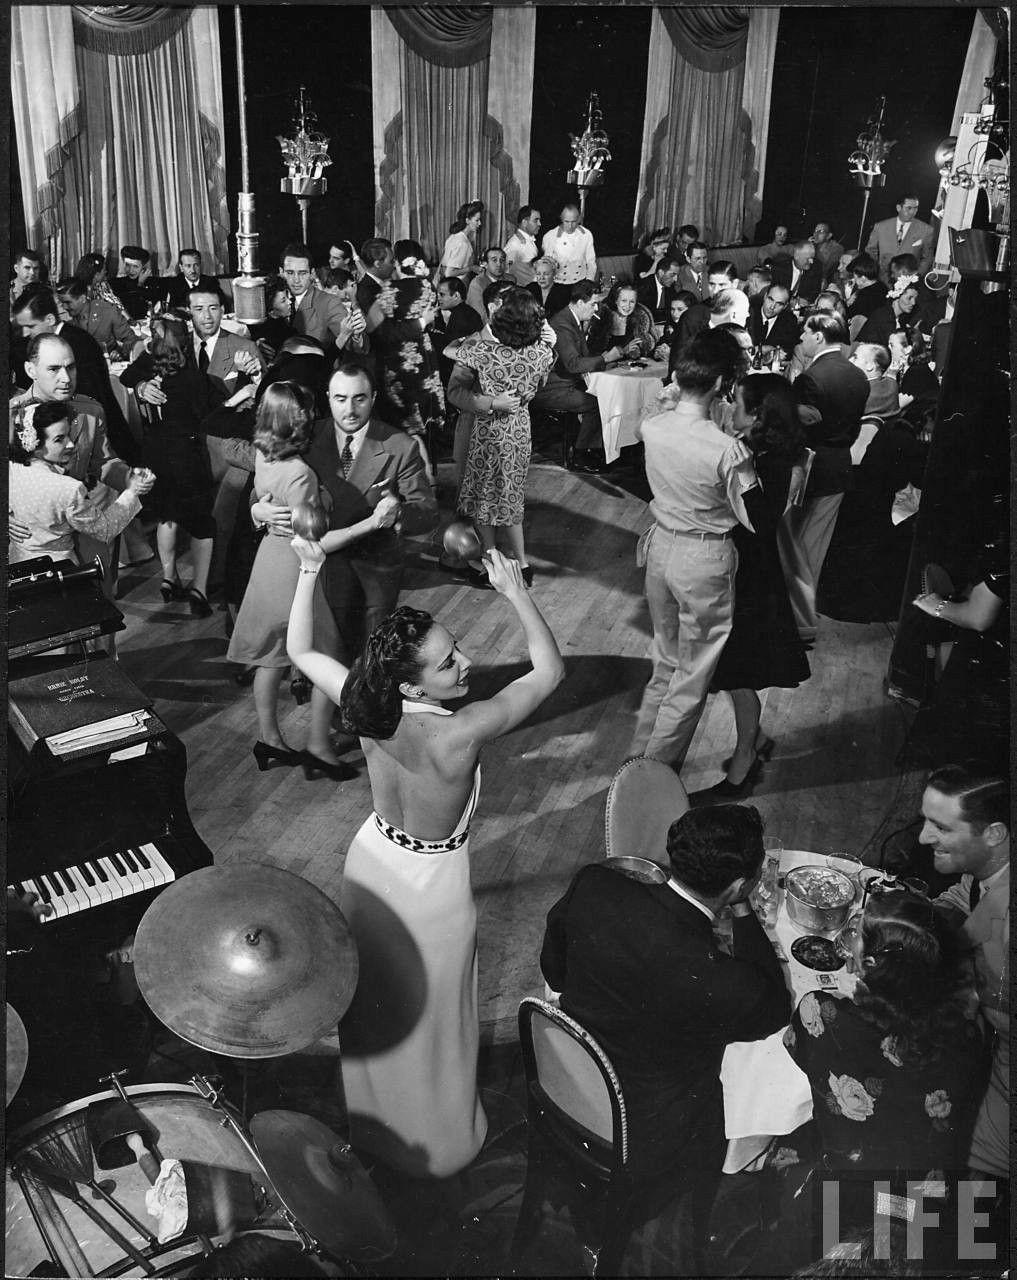 New York Dance Club 1950s Cafe Society Alfred Eisenstaedt Night Club